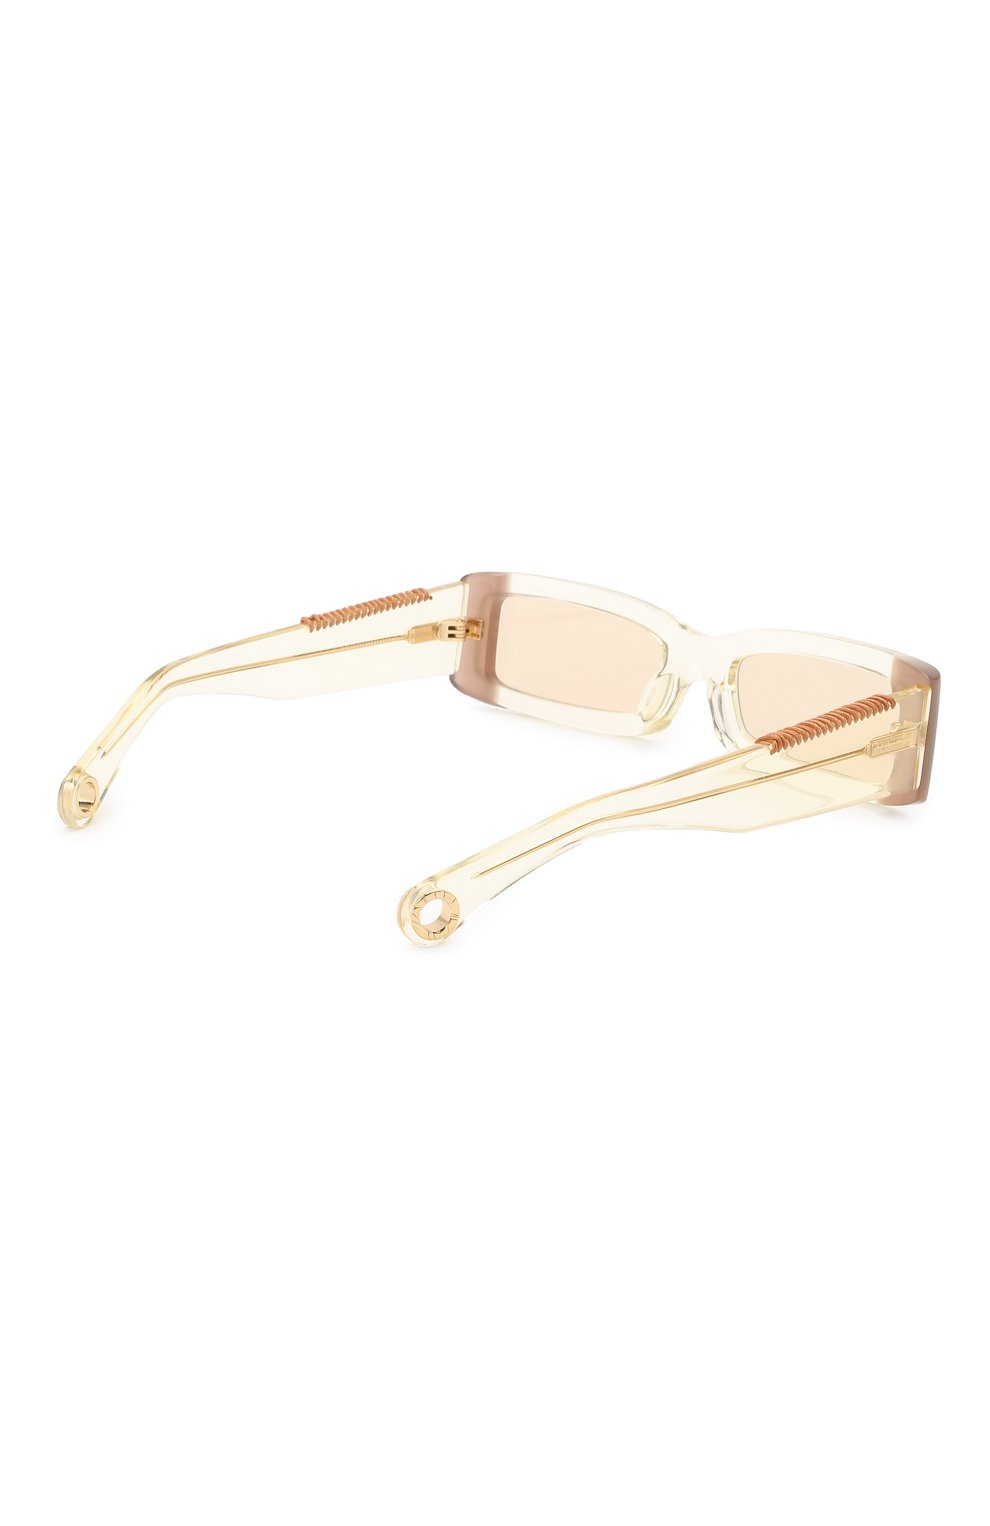 Женские солнцезащитные очки JACQUEMUS бежевого цвета, арт. LES LUNETTES 97 YELL0W | Фото 5